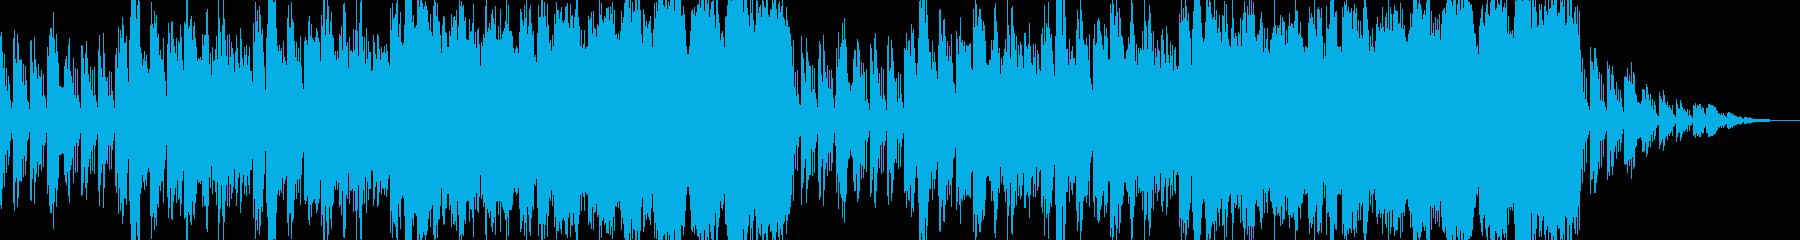 RPG 通常フィールド移動の再生済みの波形